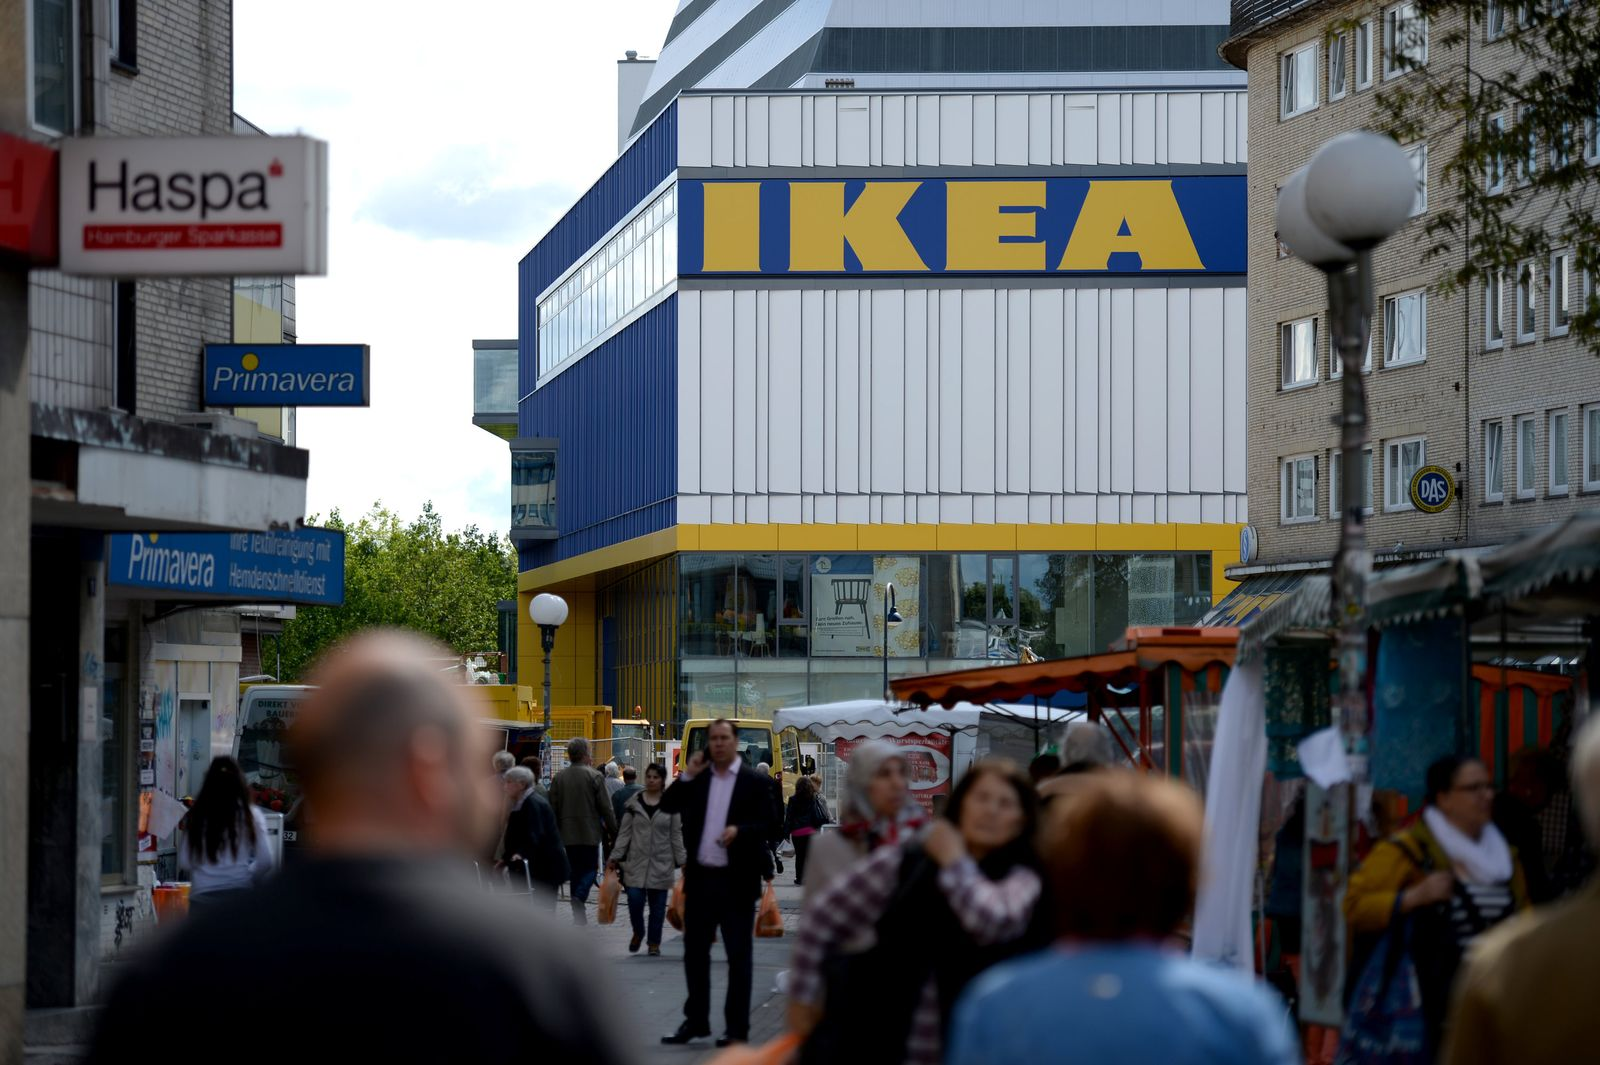 Neues IKEA-Einrichtungshaus in Hamburg-Altona